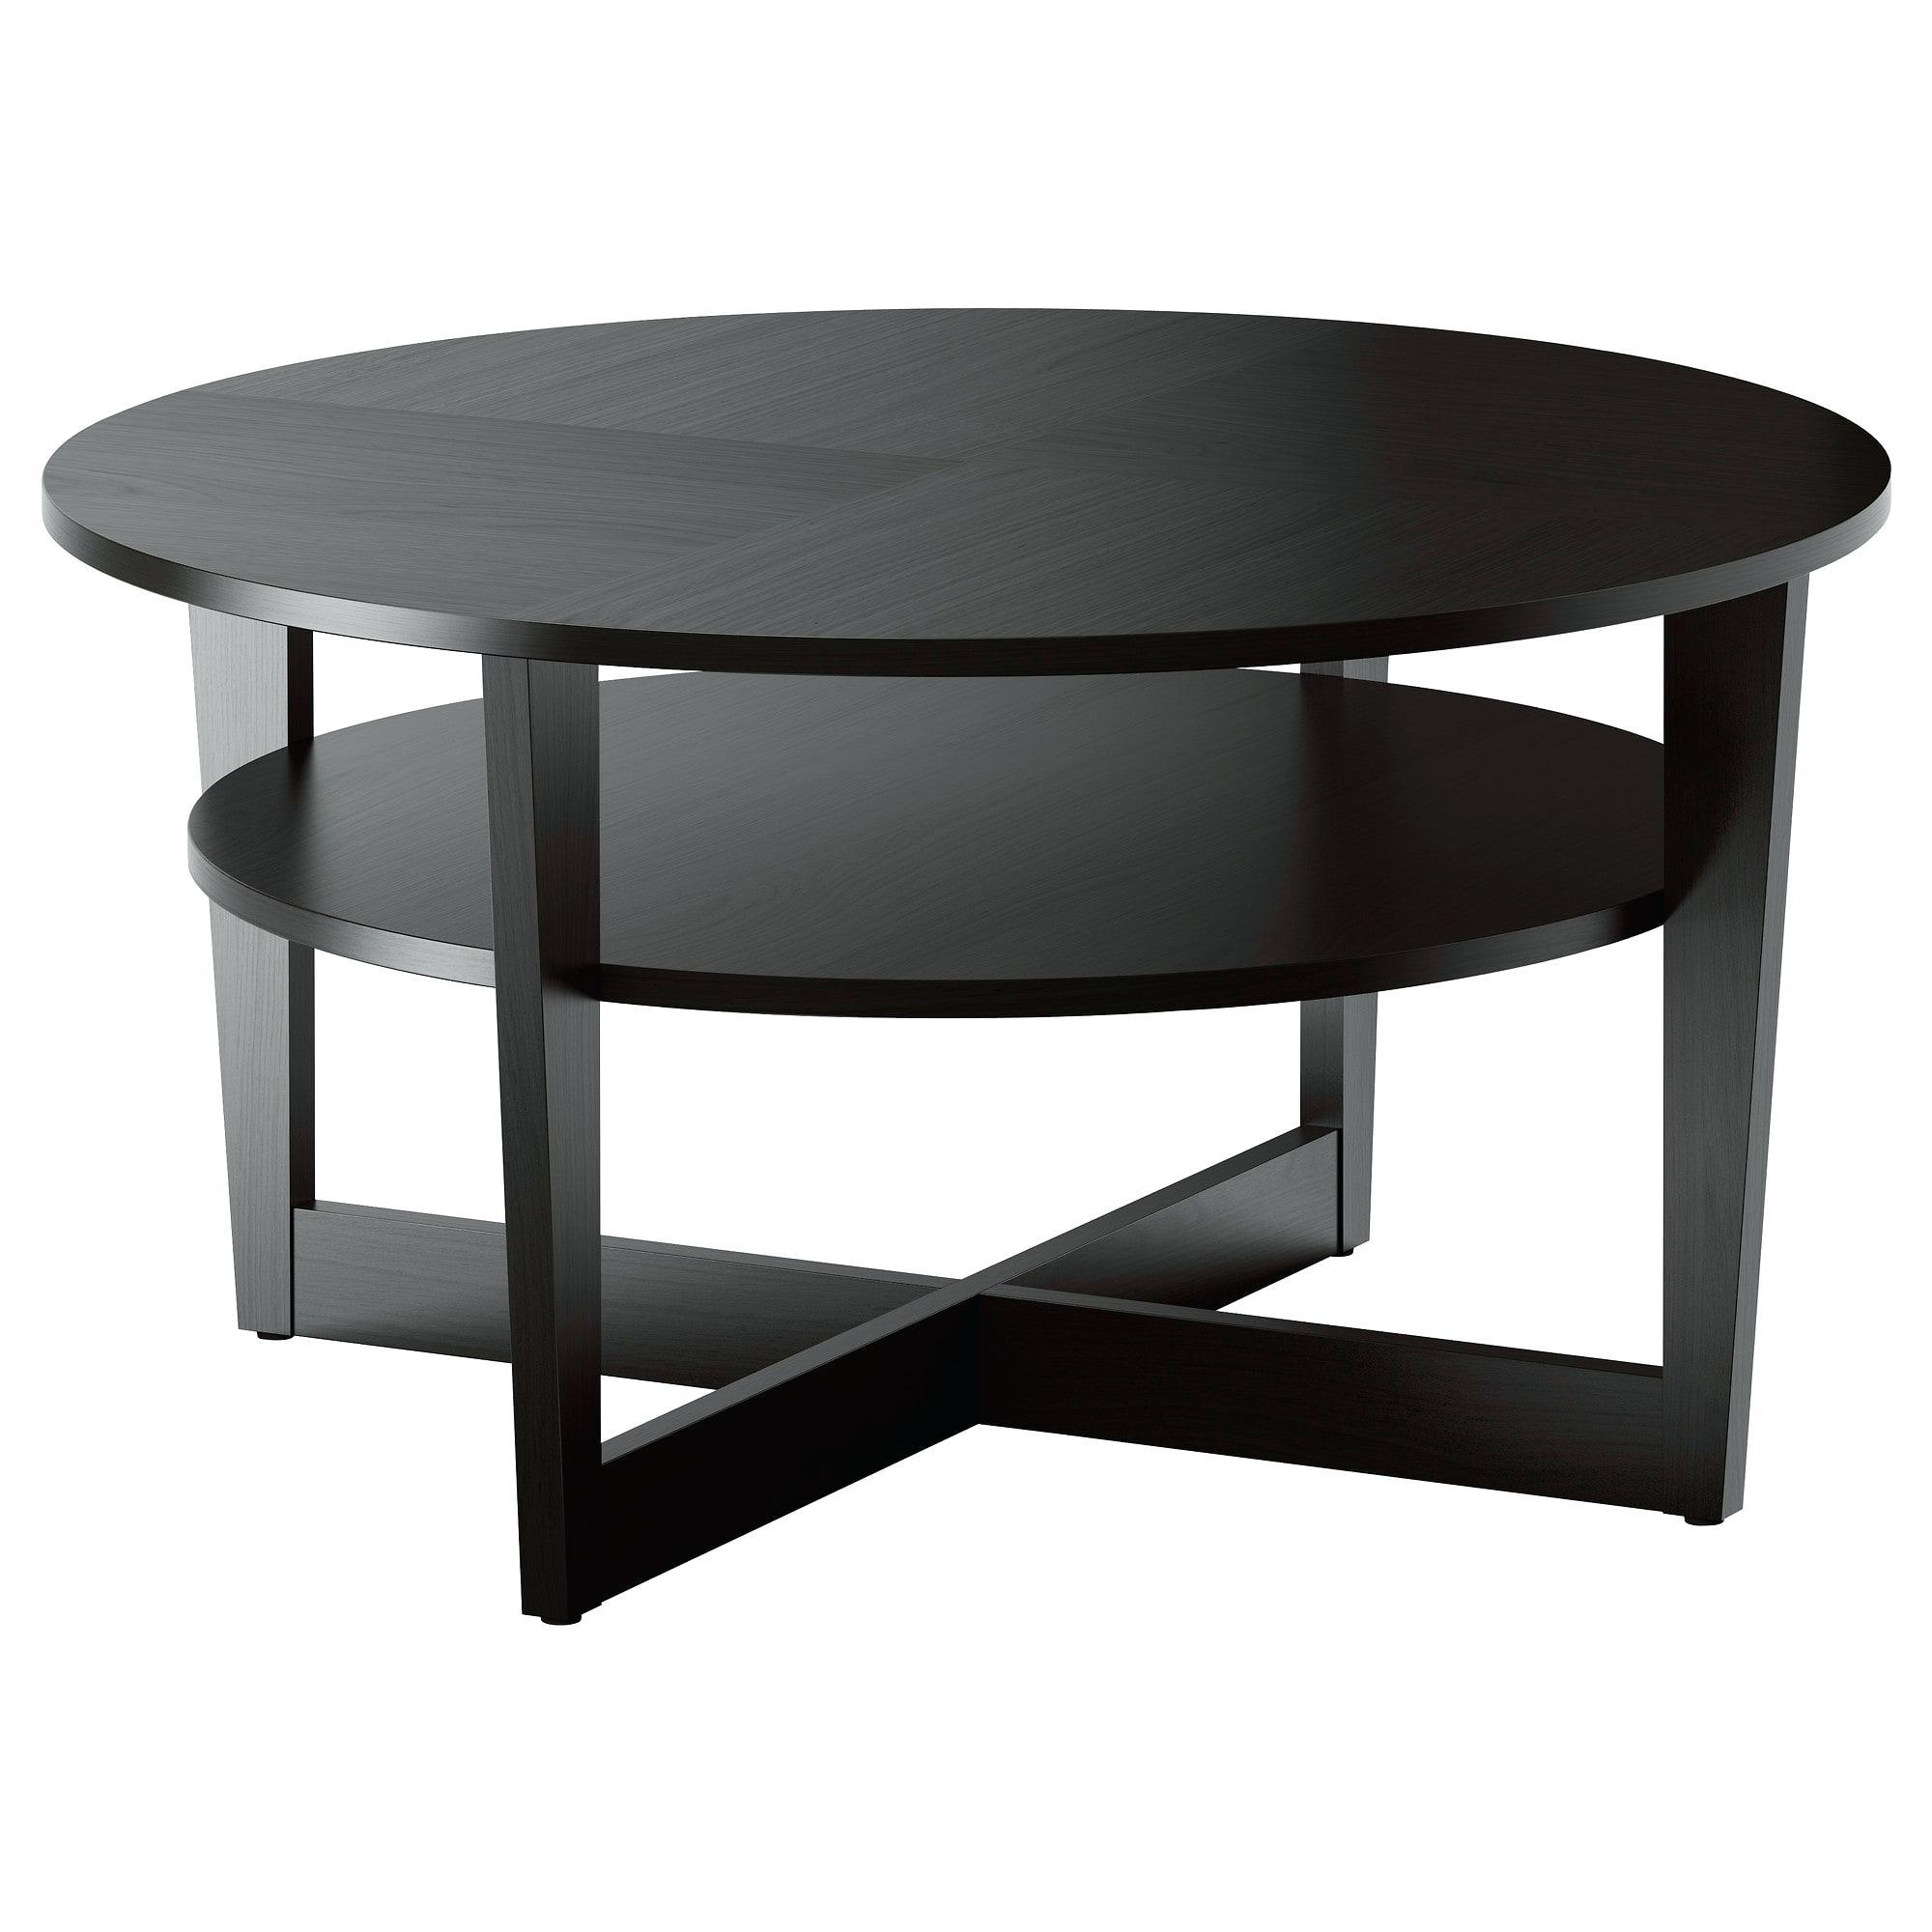 Table Basse Ikea Noir – Razvan.co destiné Table Ronde Jardin Ikea